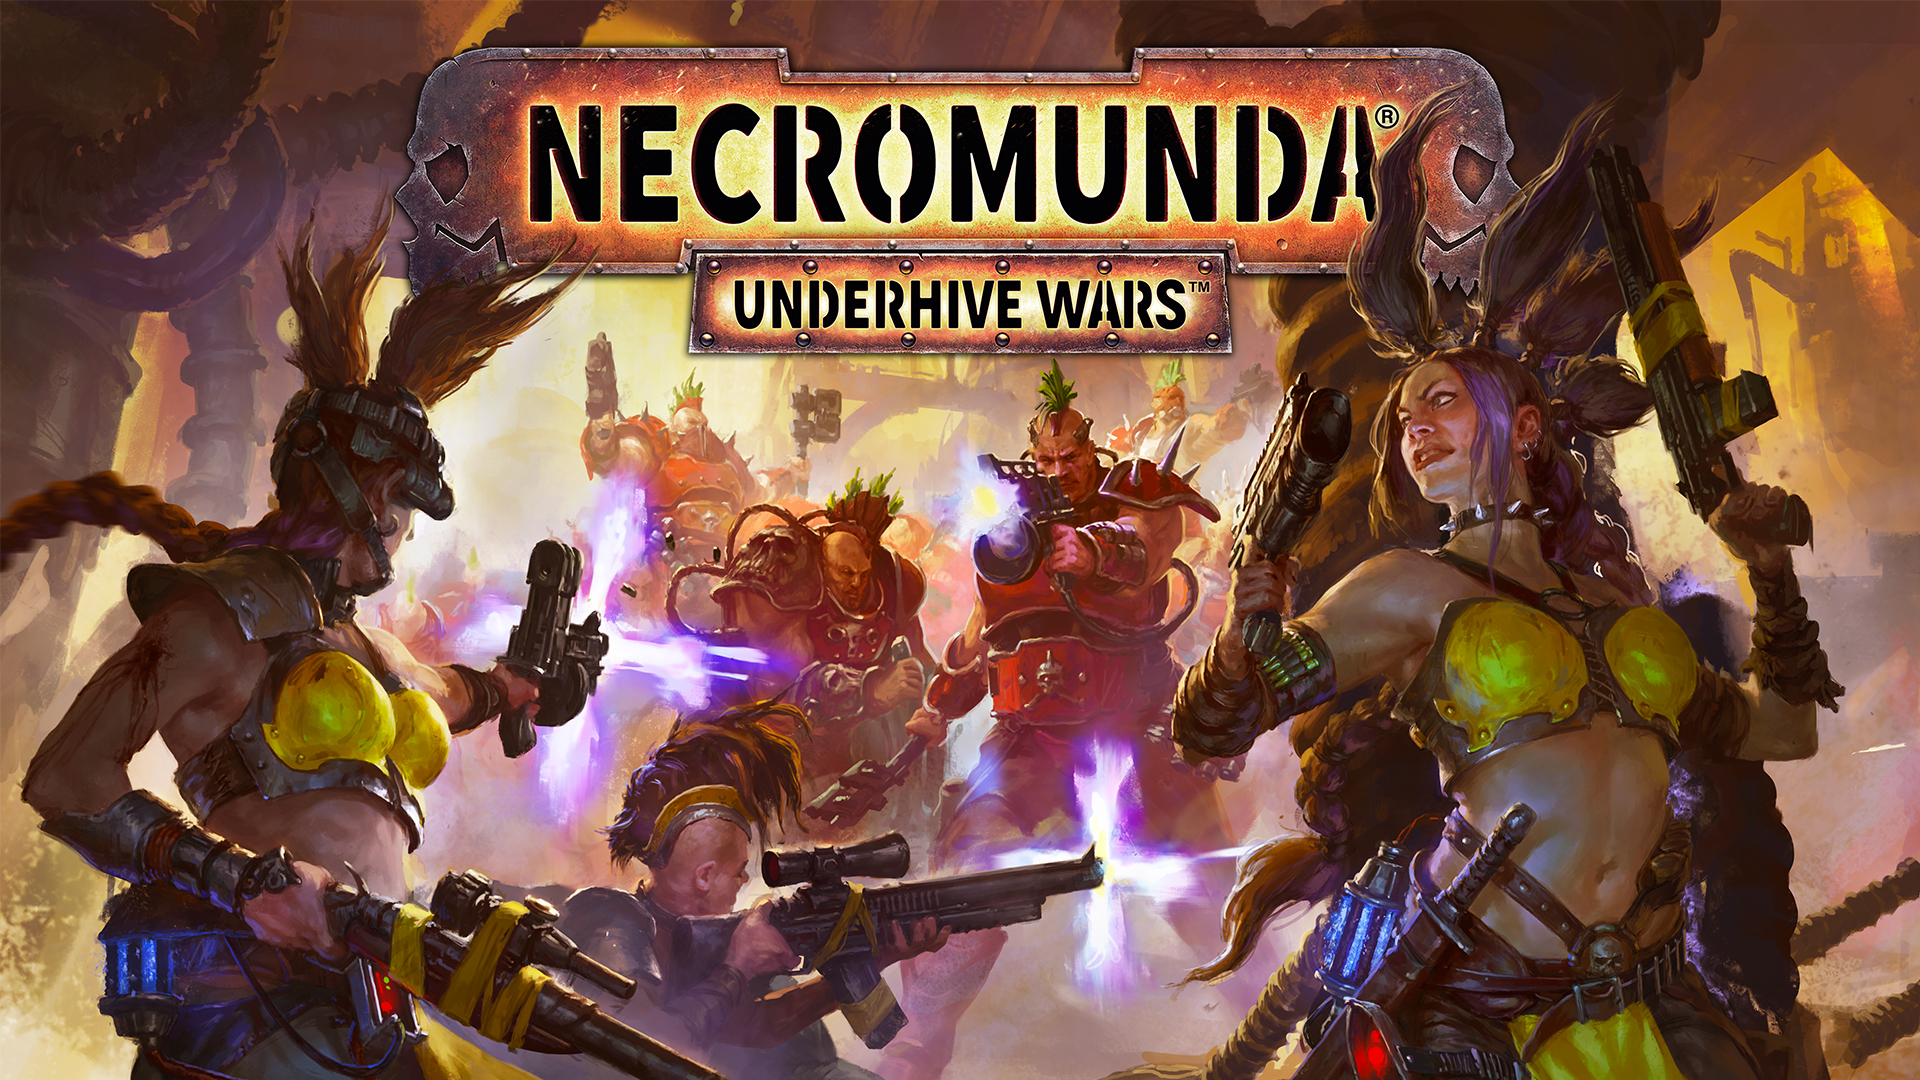 Necromunda Underhive Wars Concept Art